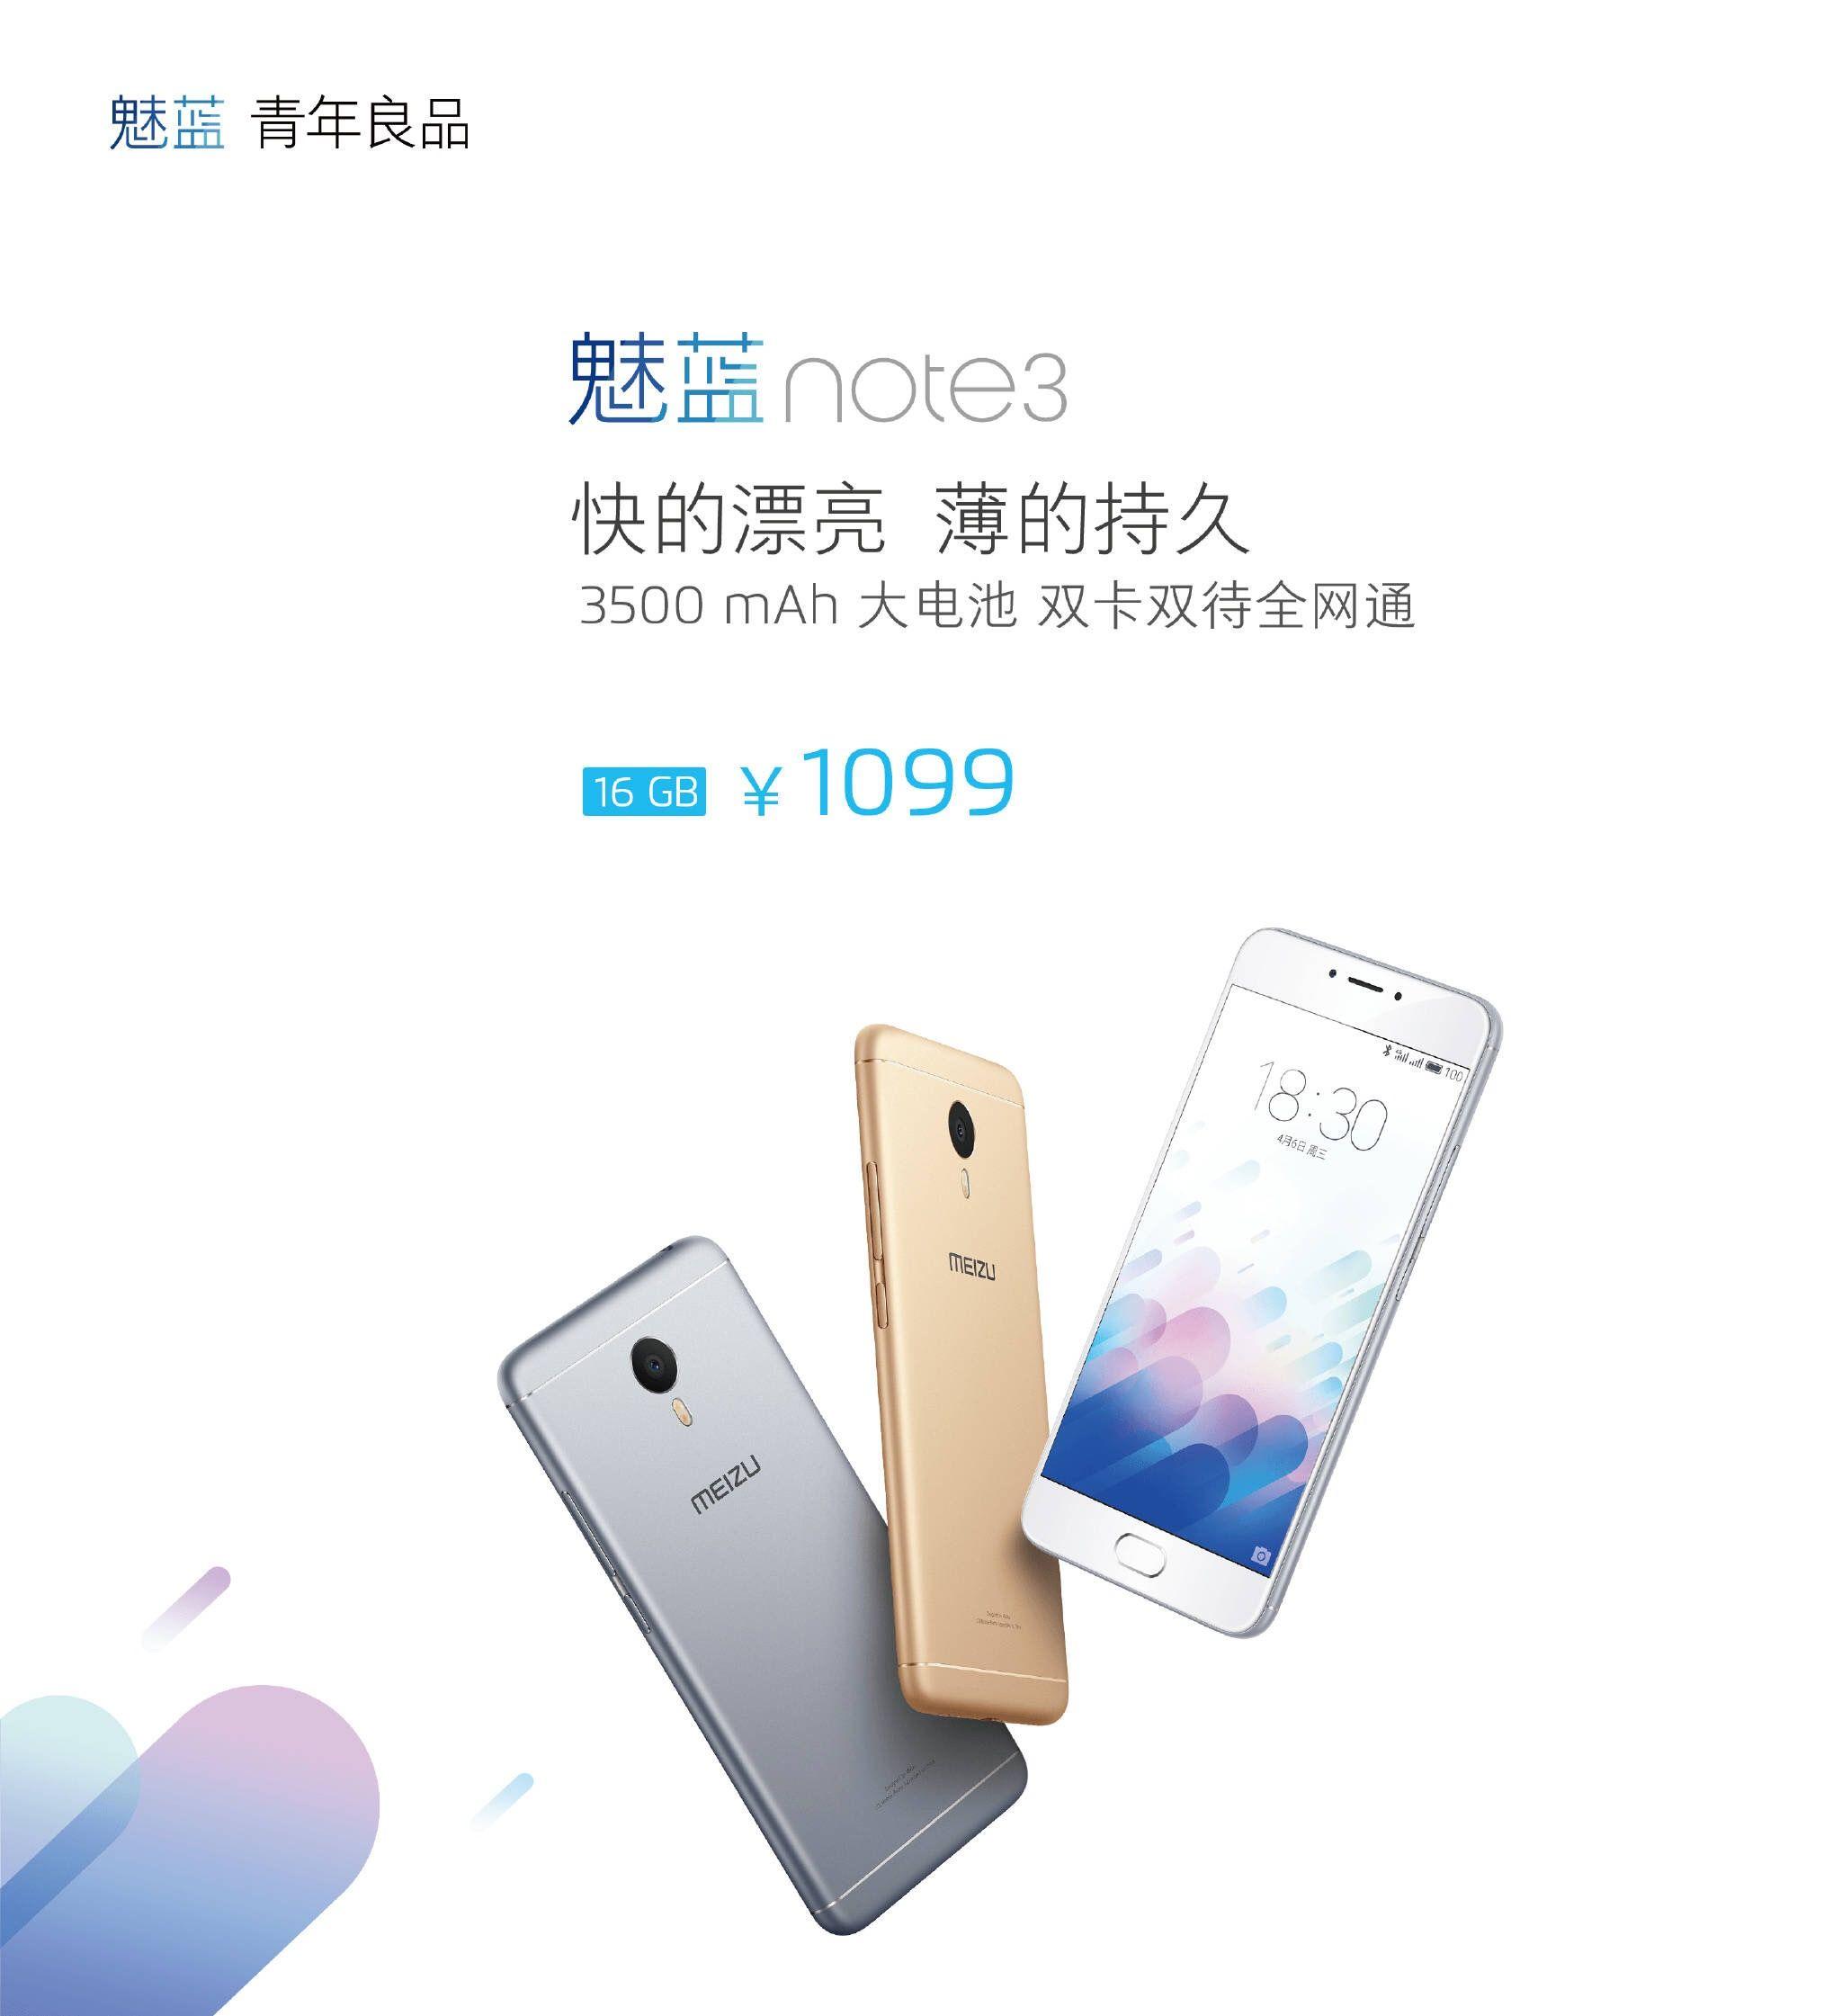 Meizu m3 noteのプロモーション画像がリーク。シルバーとゴールドの2色展開の可能性